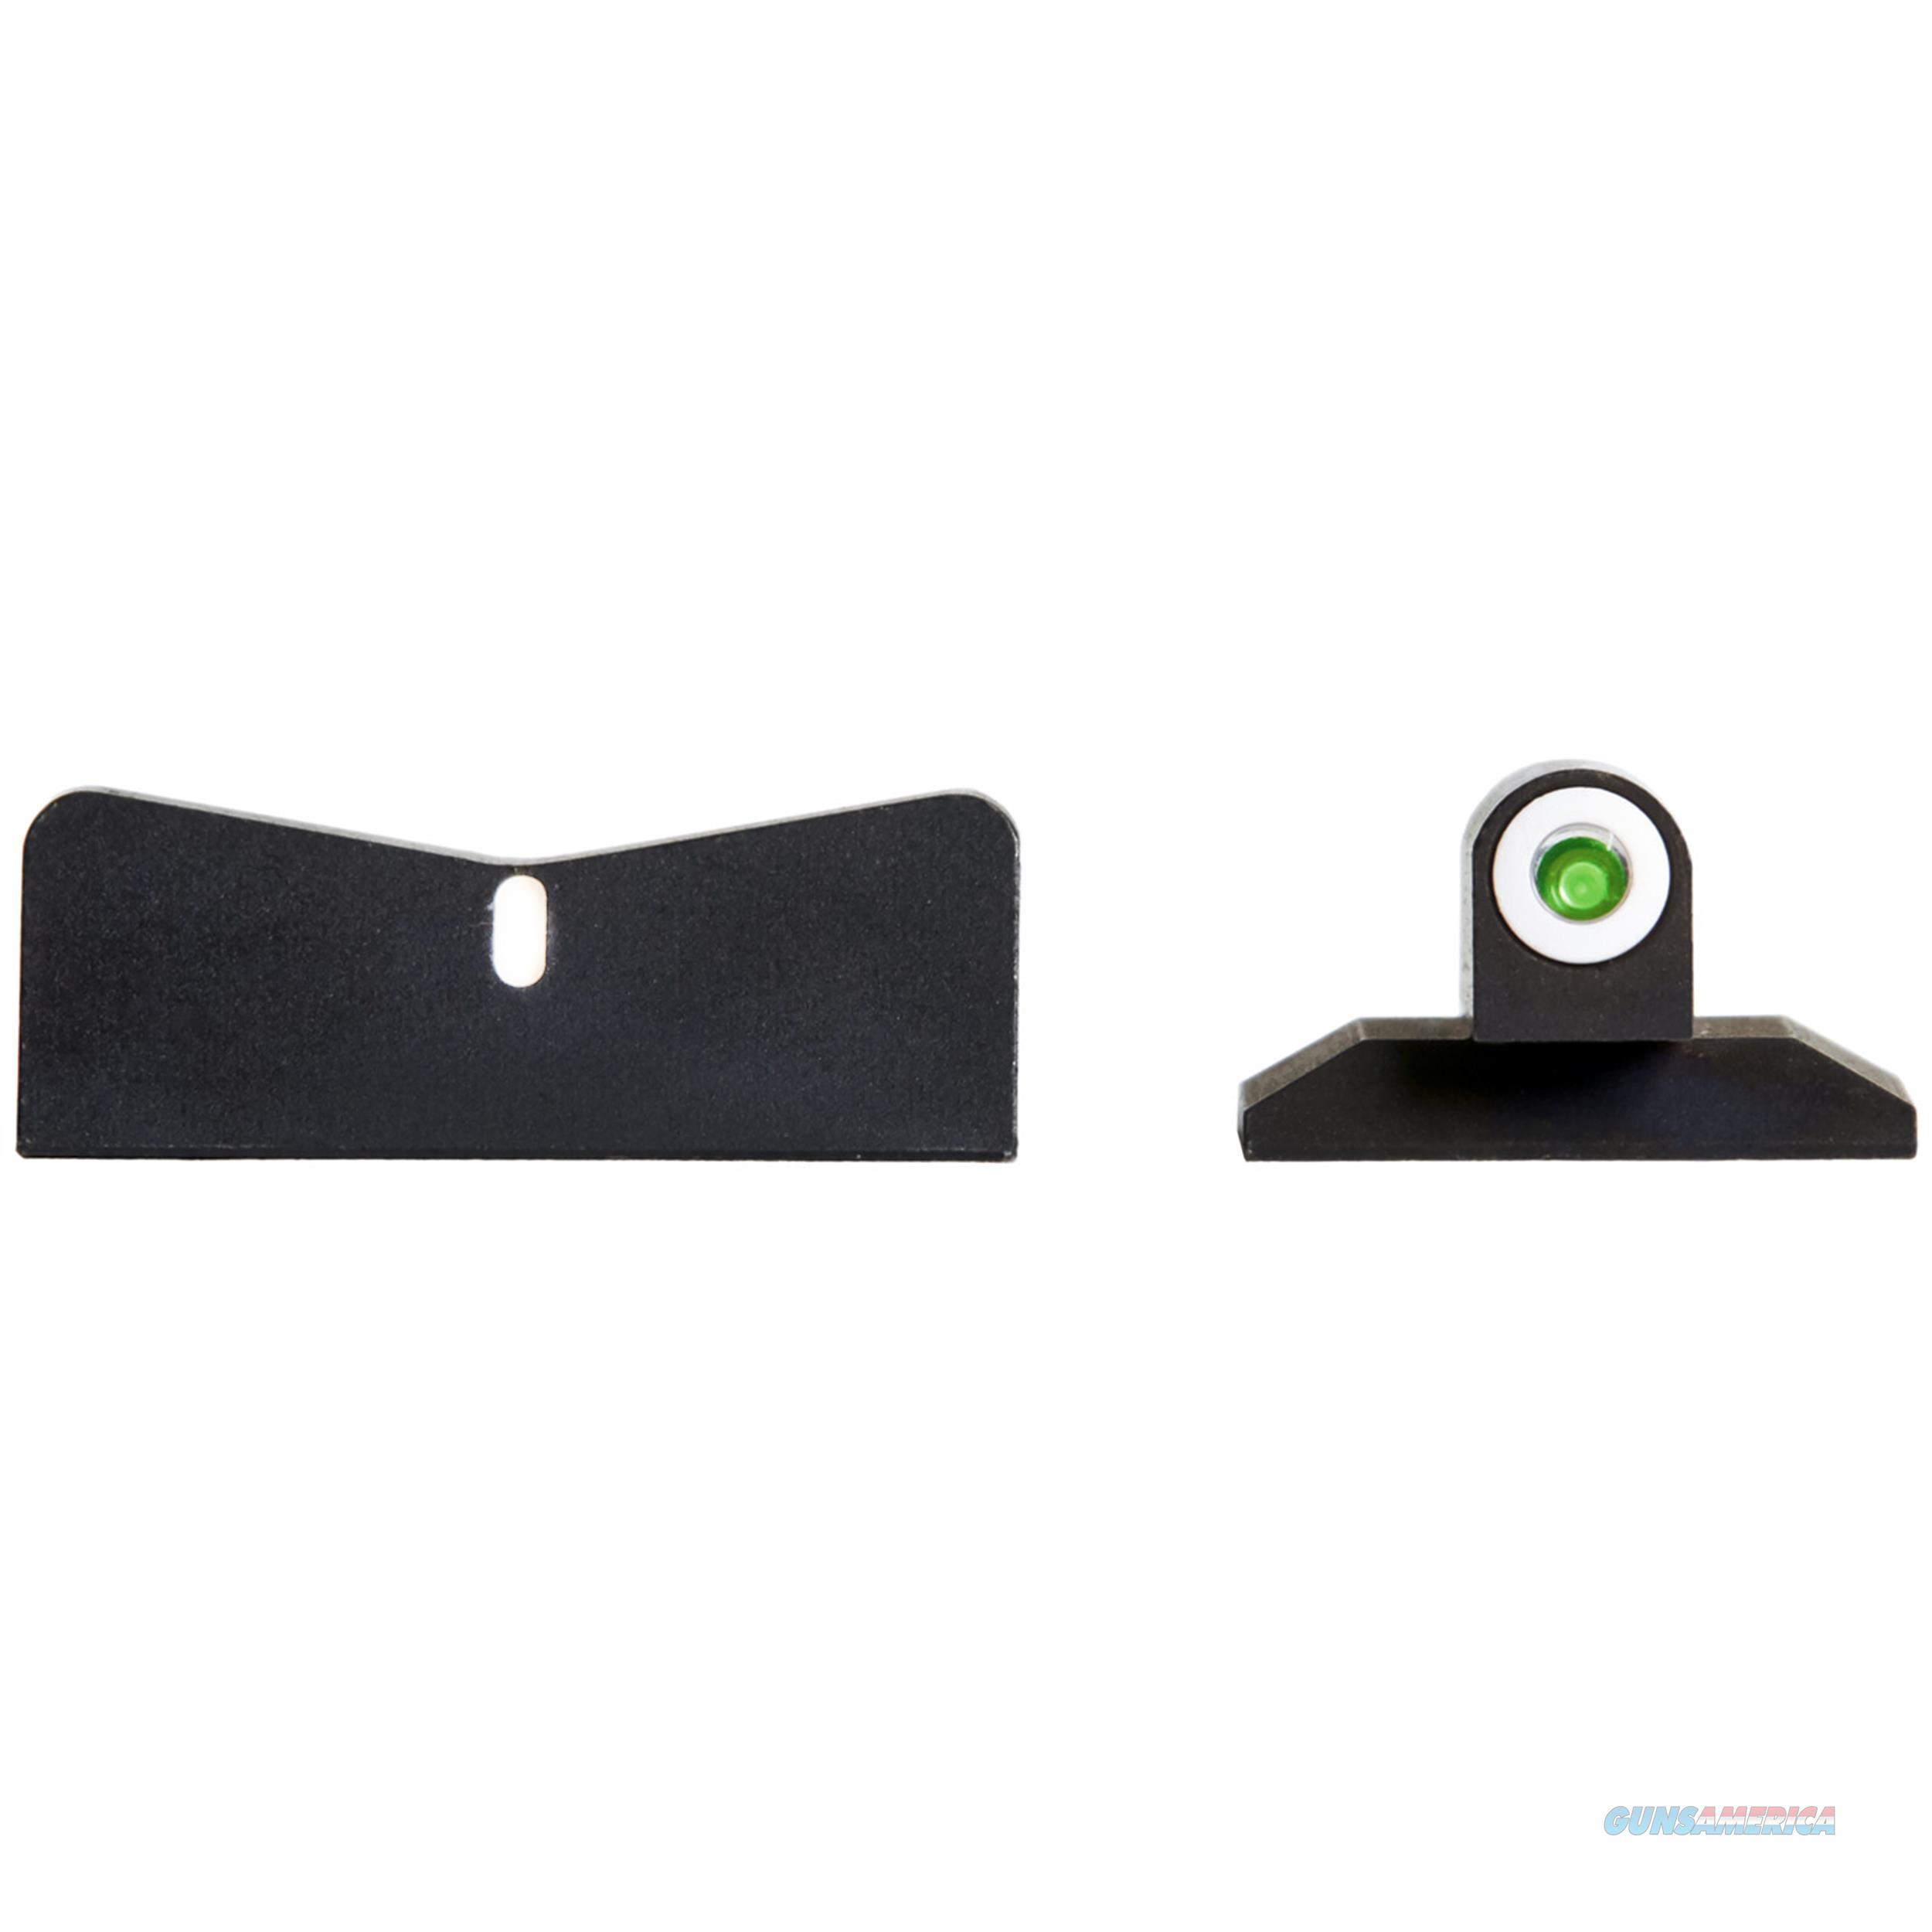 Xs Sights Dxw Standard Dot FN0002P4  Non-Guns > Iron/Metal/Peep Sights